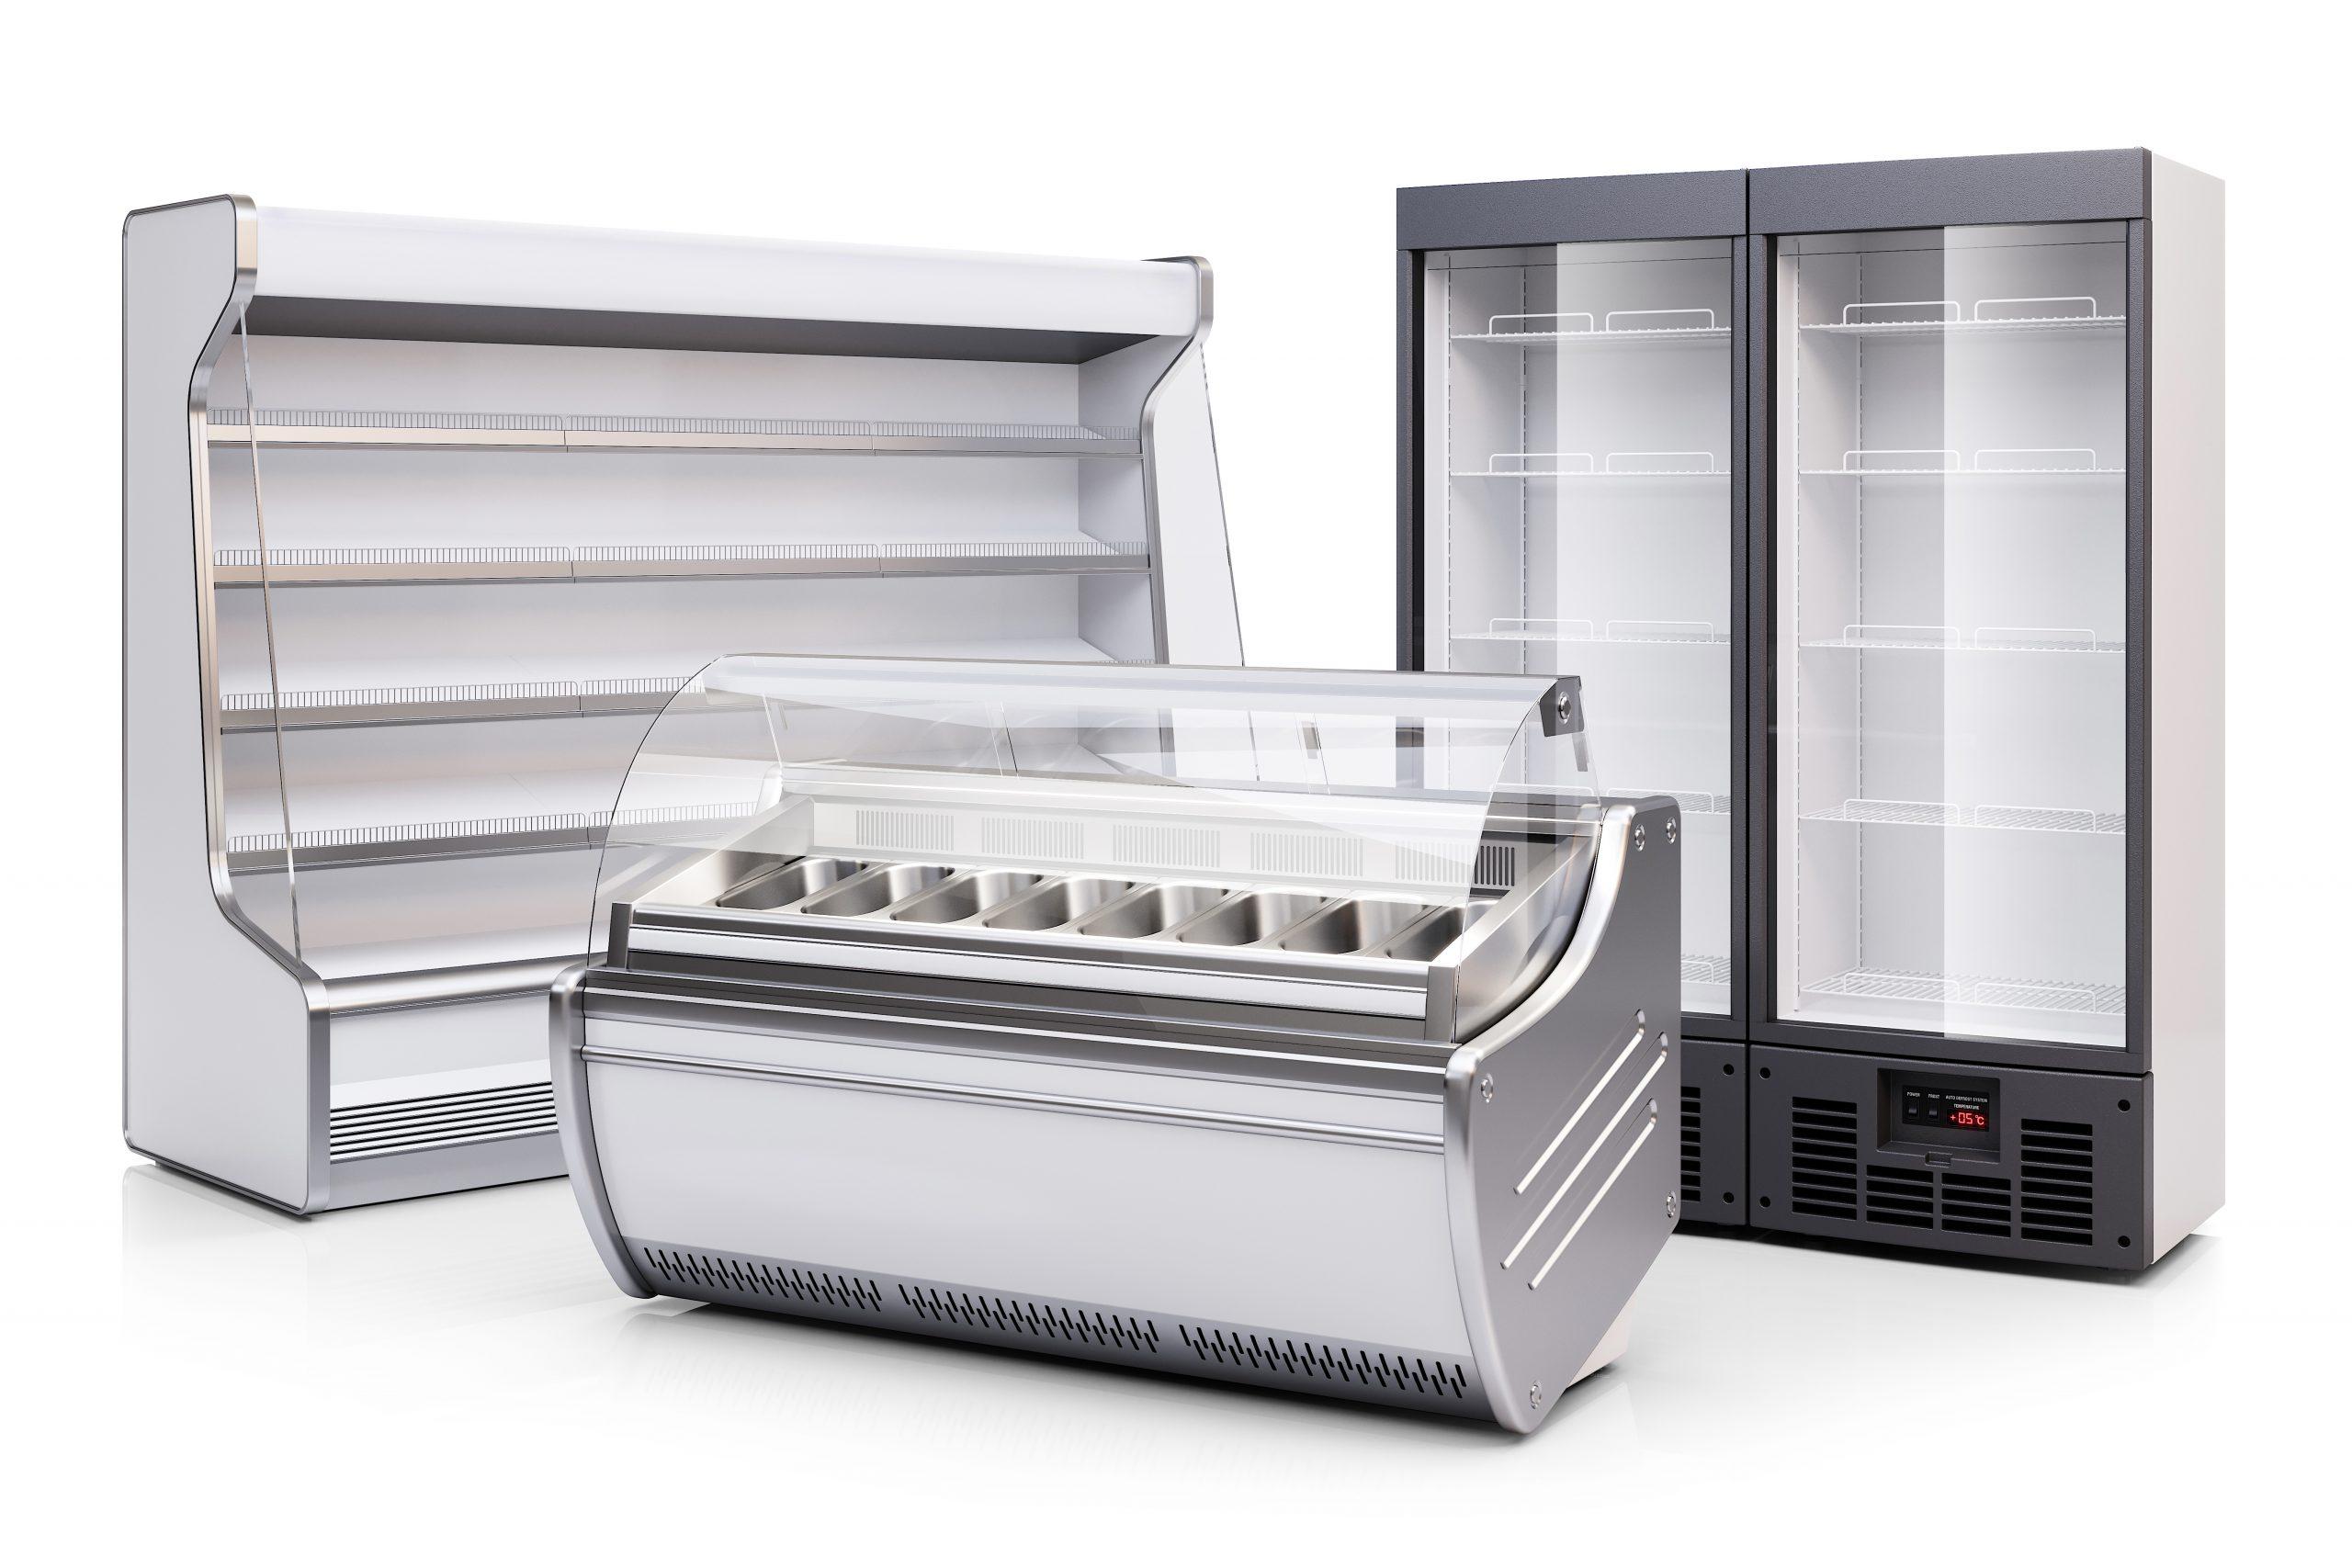 modèles de vitrine réfrigérée